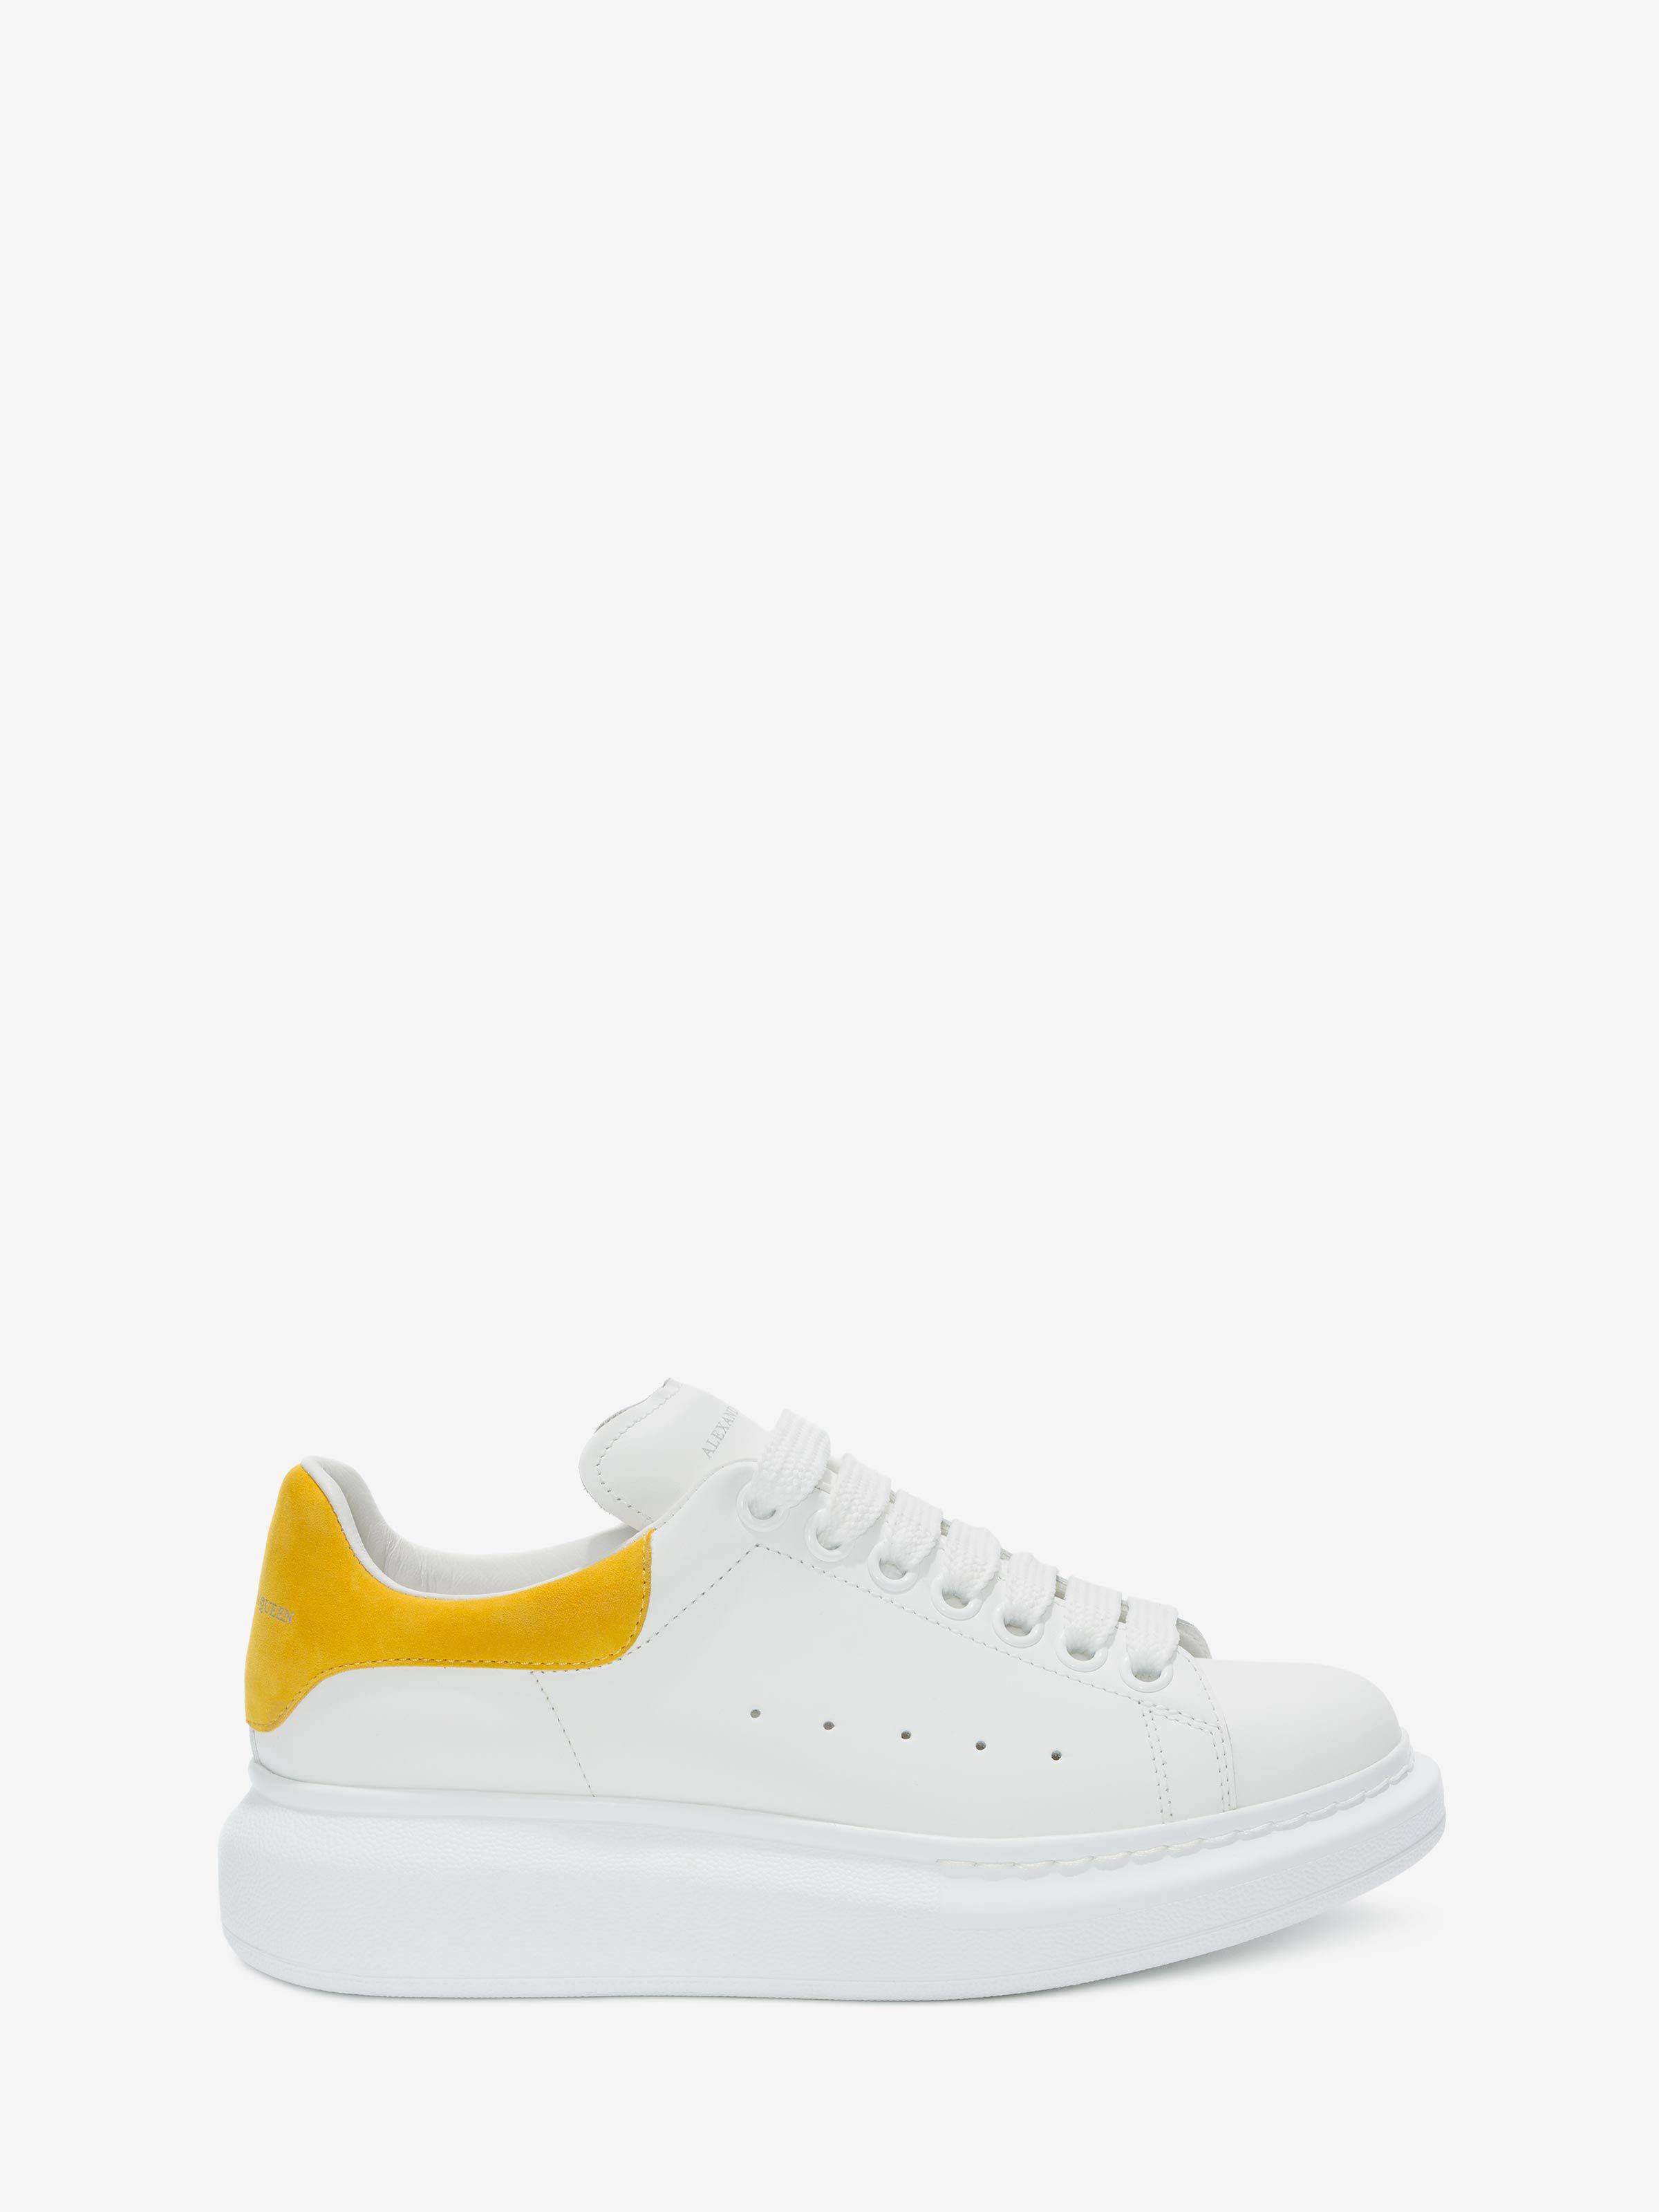 VANS Old Skool Plateau Sneaker mit Leder Details • de Bijenkorf